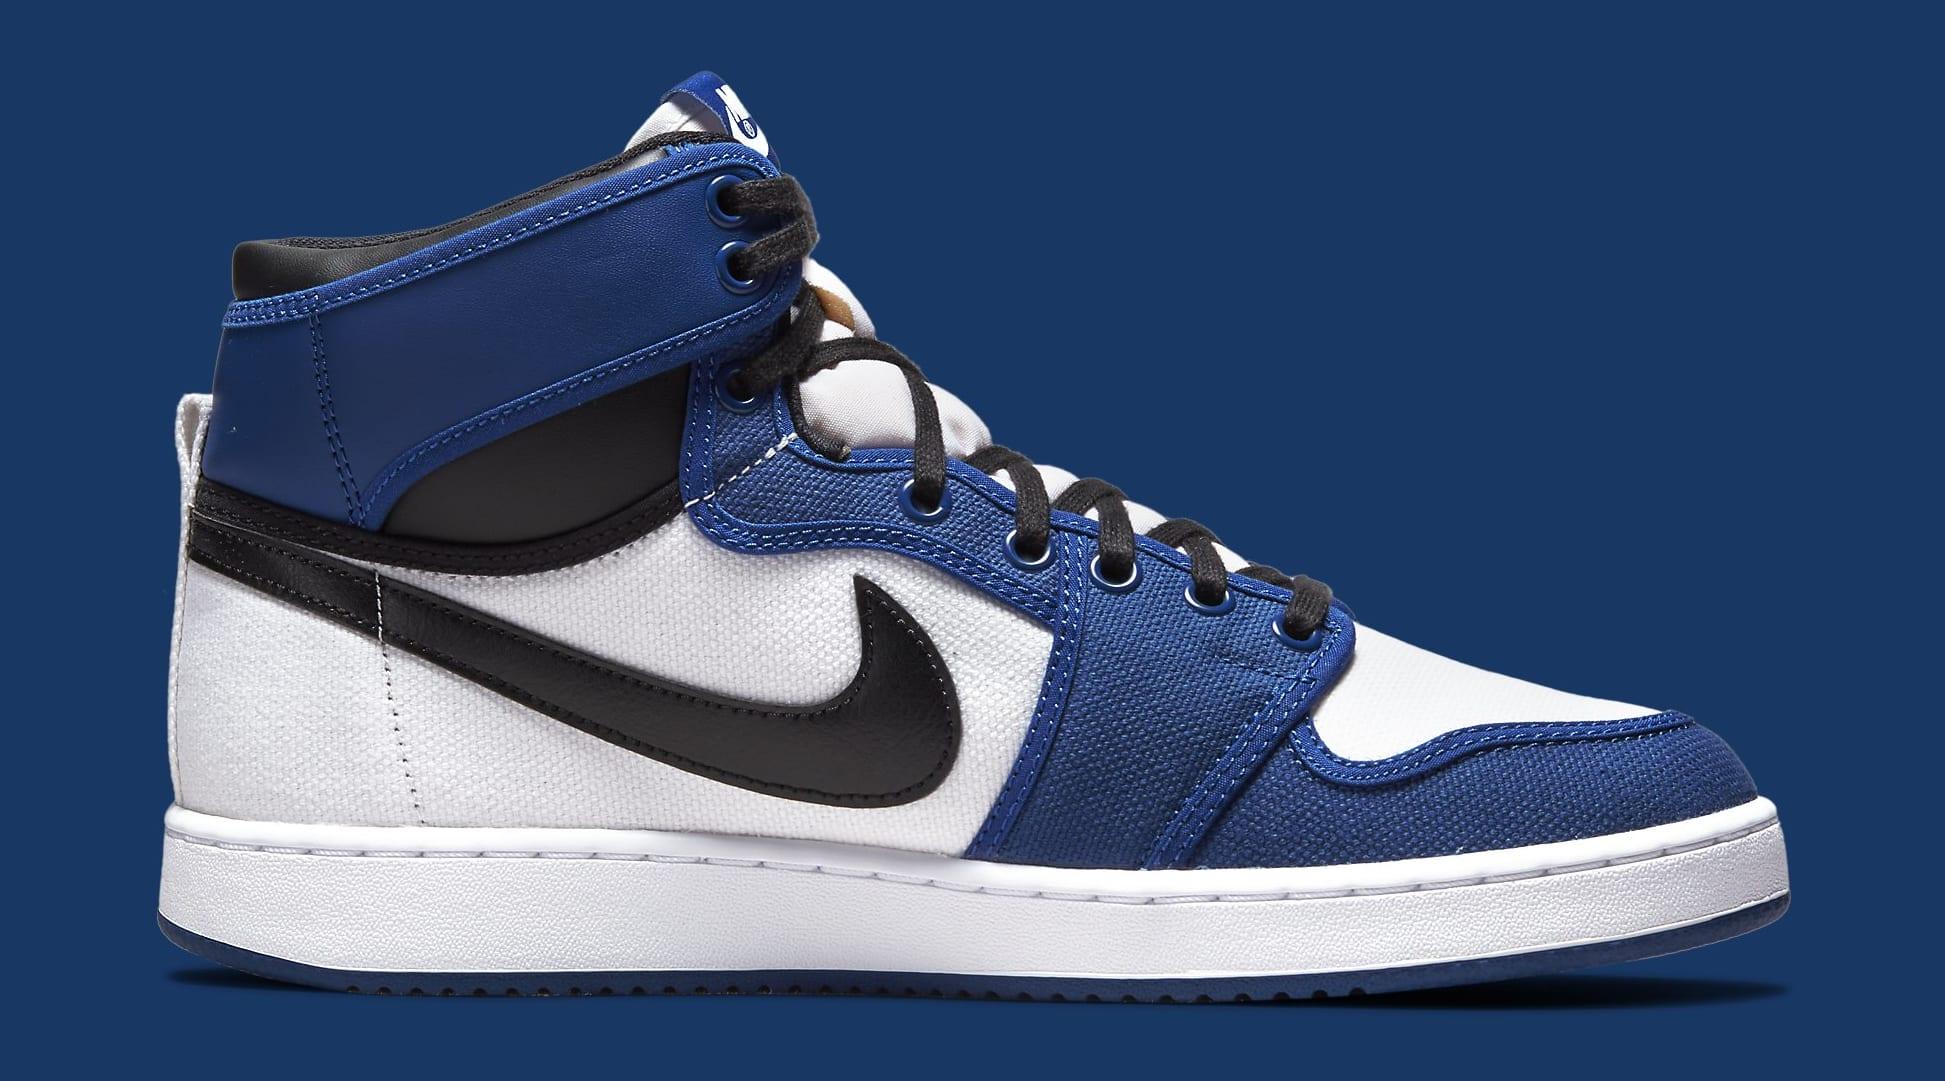 Air Jordan 1 KO 'Storm Blue' DO5047-401 Medial